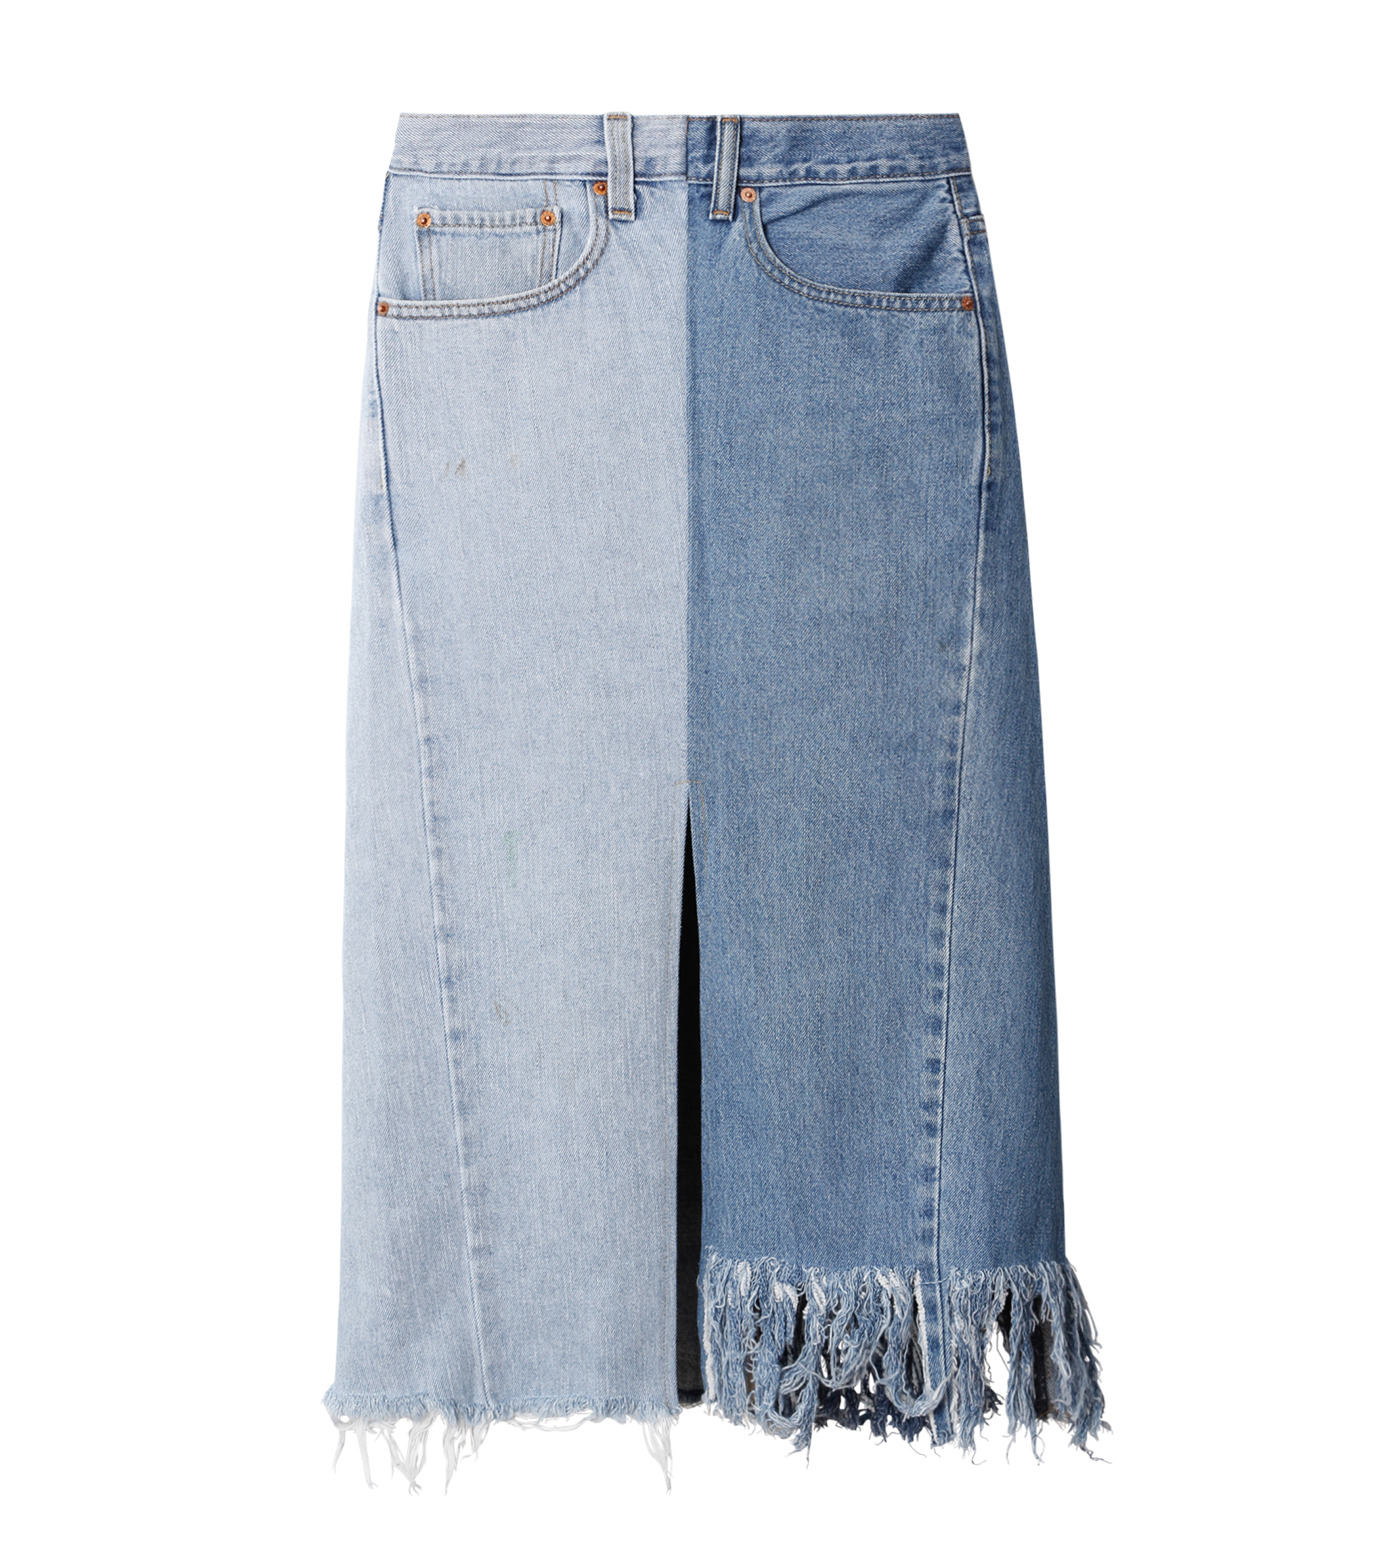 77circa(77サーカ)のFringe Denim Skirt-INDIGO(スカート/skirt)-cc16ss-49-94 拡大詳細画像1